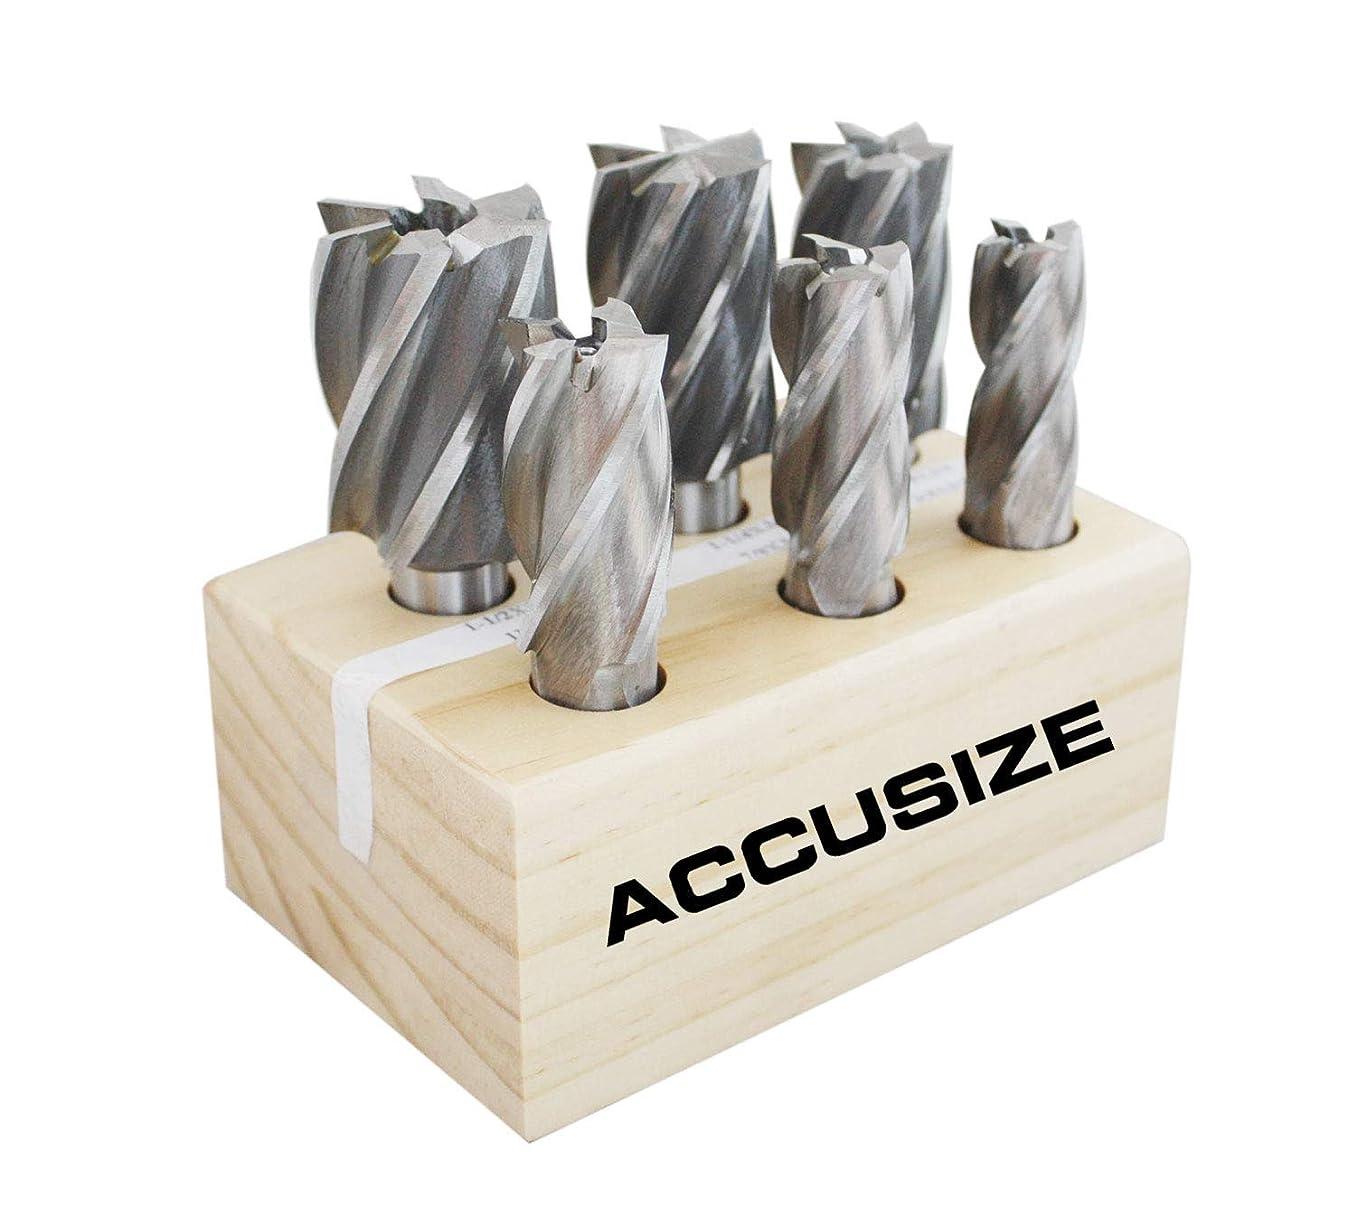 AccusizeTools - 6 Pcs H.S.S. End Mills Set, Multi Flute (3/4'' to 1-1/2''), Ground, 1822-0206